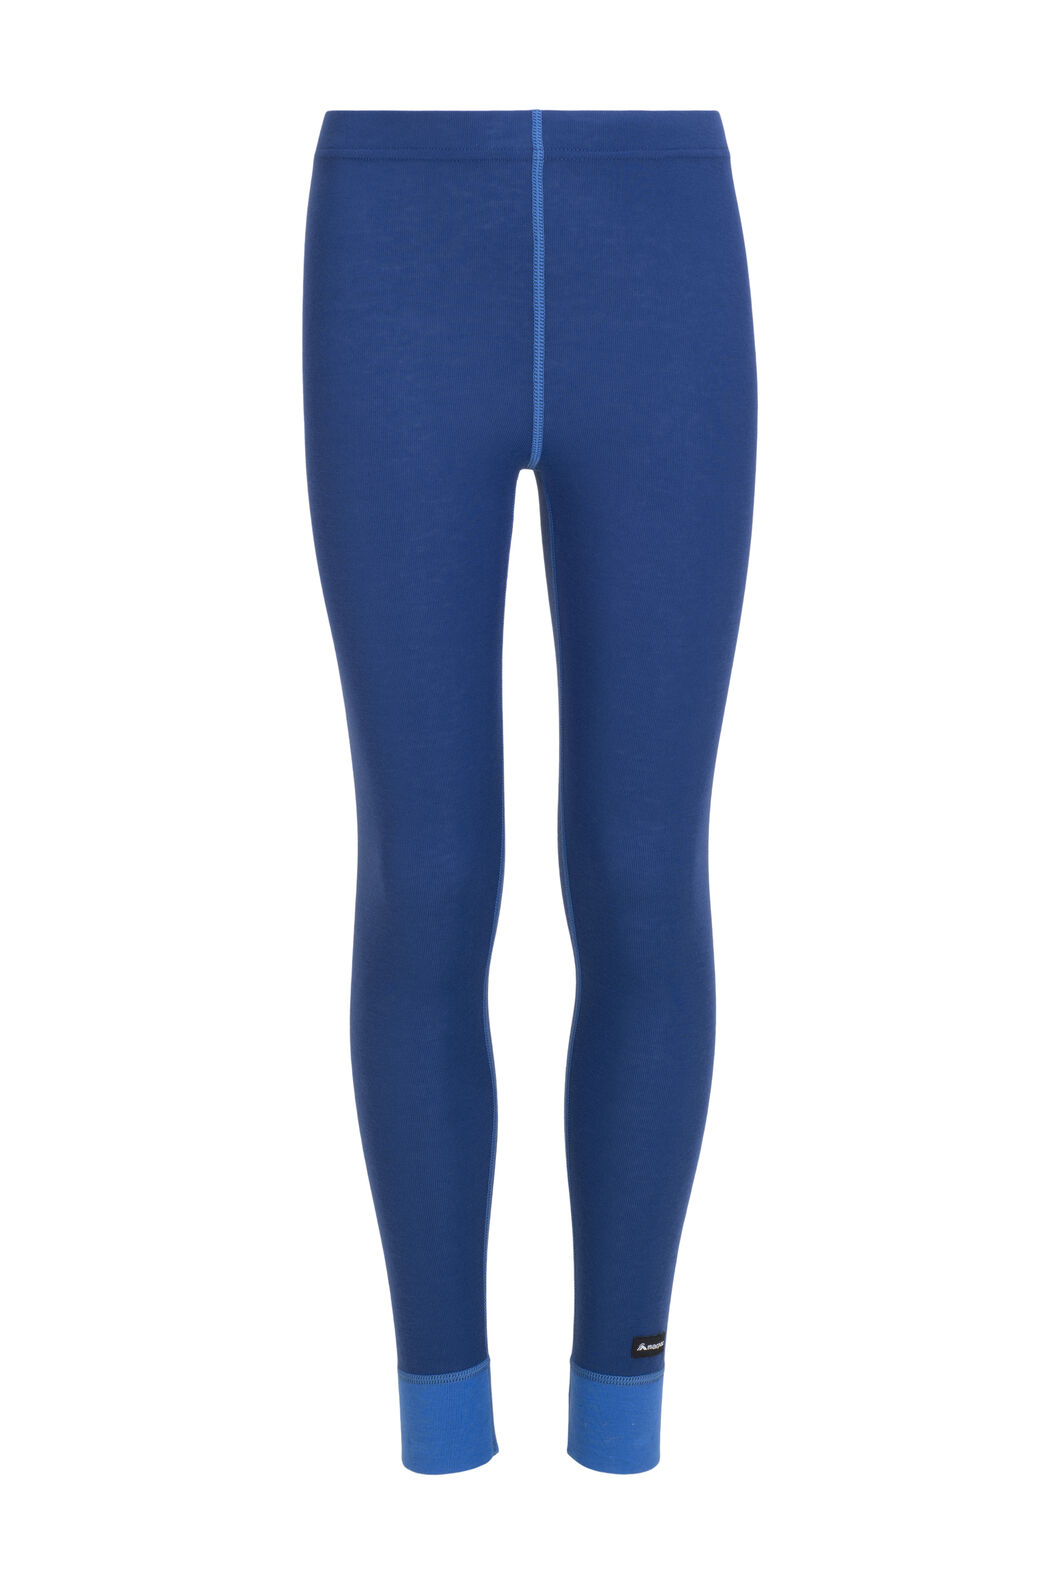 Macpac Geothermal Pants — Kids', Sodalite Blue/Strong Blue, hi-res